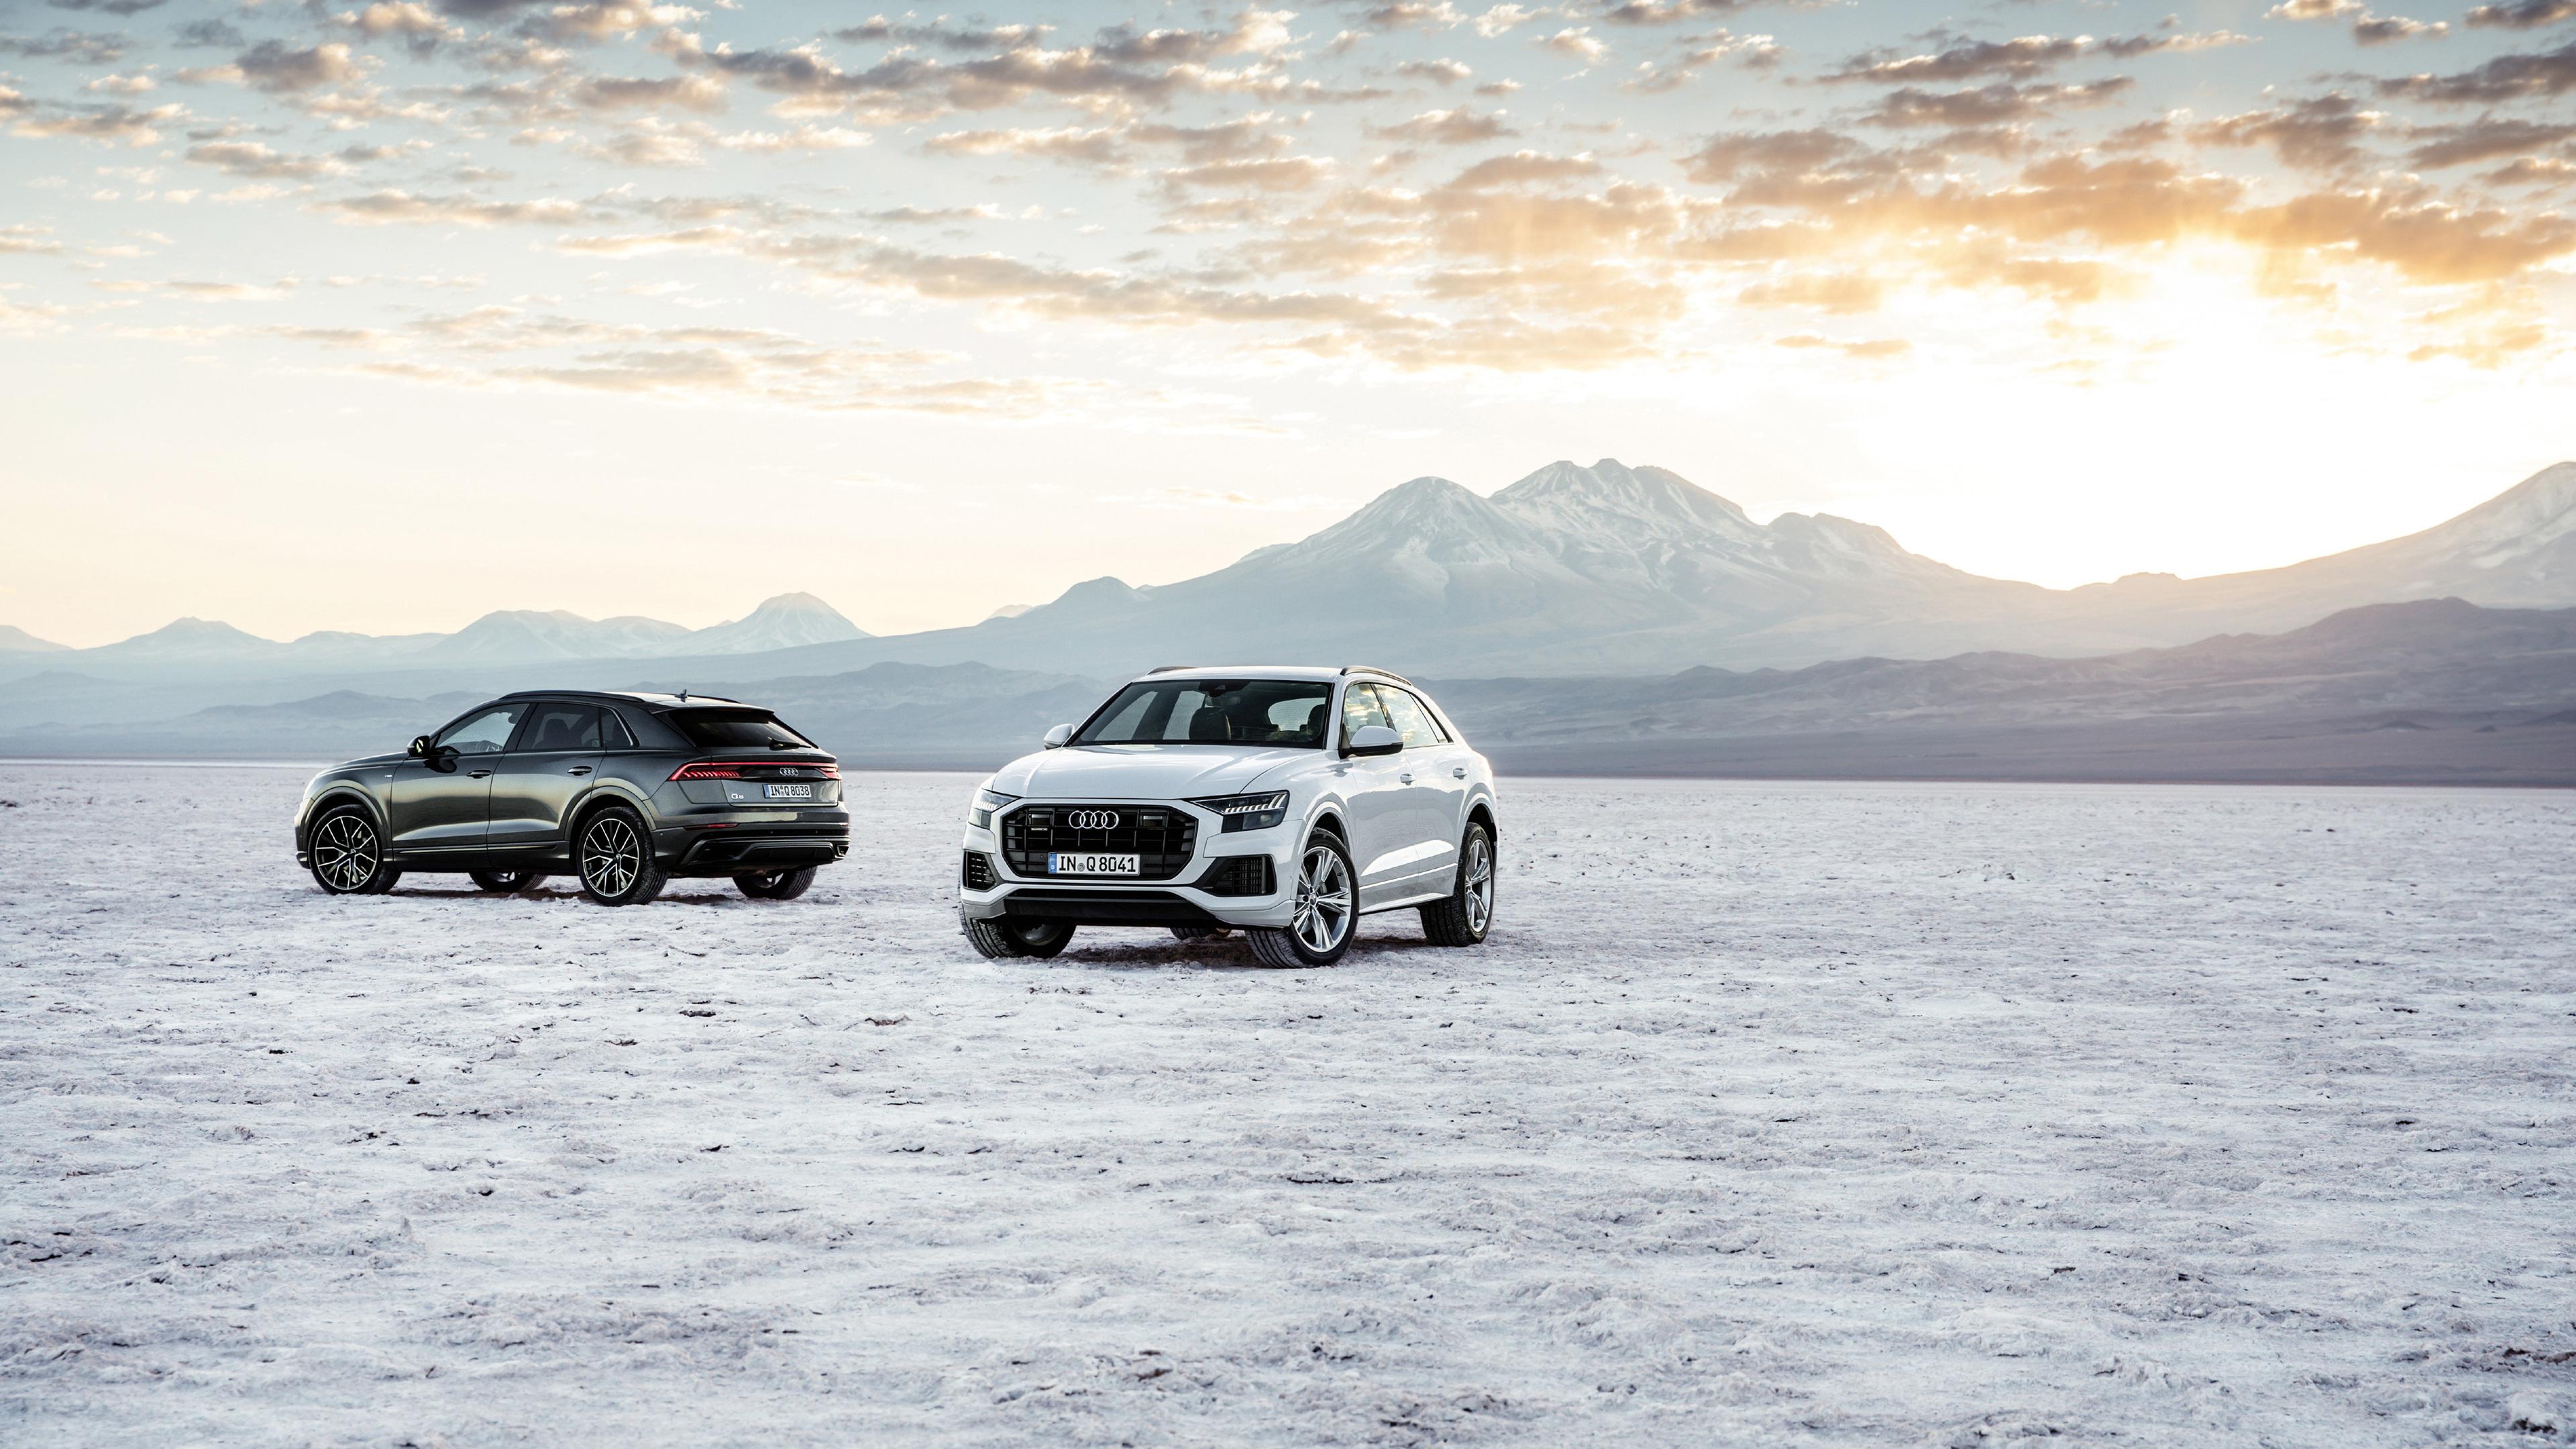 audi q8 cars 1539112214 - Audi Q8 Cars - hd-wallpapers, cars wallpapers, audi wallpapers, audi q8 wallpapers, 4k-wallpapers, 2018 cars wallpapers